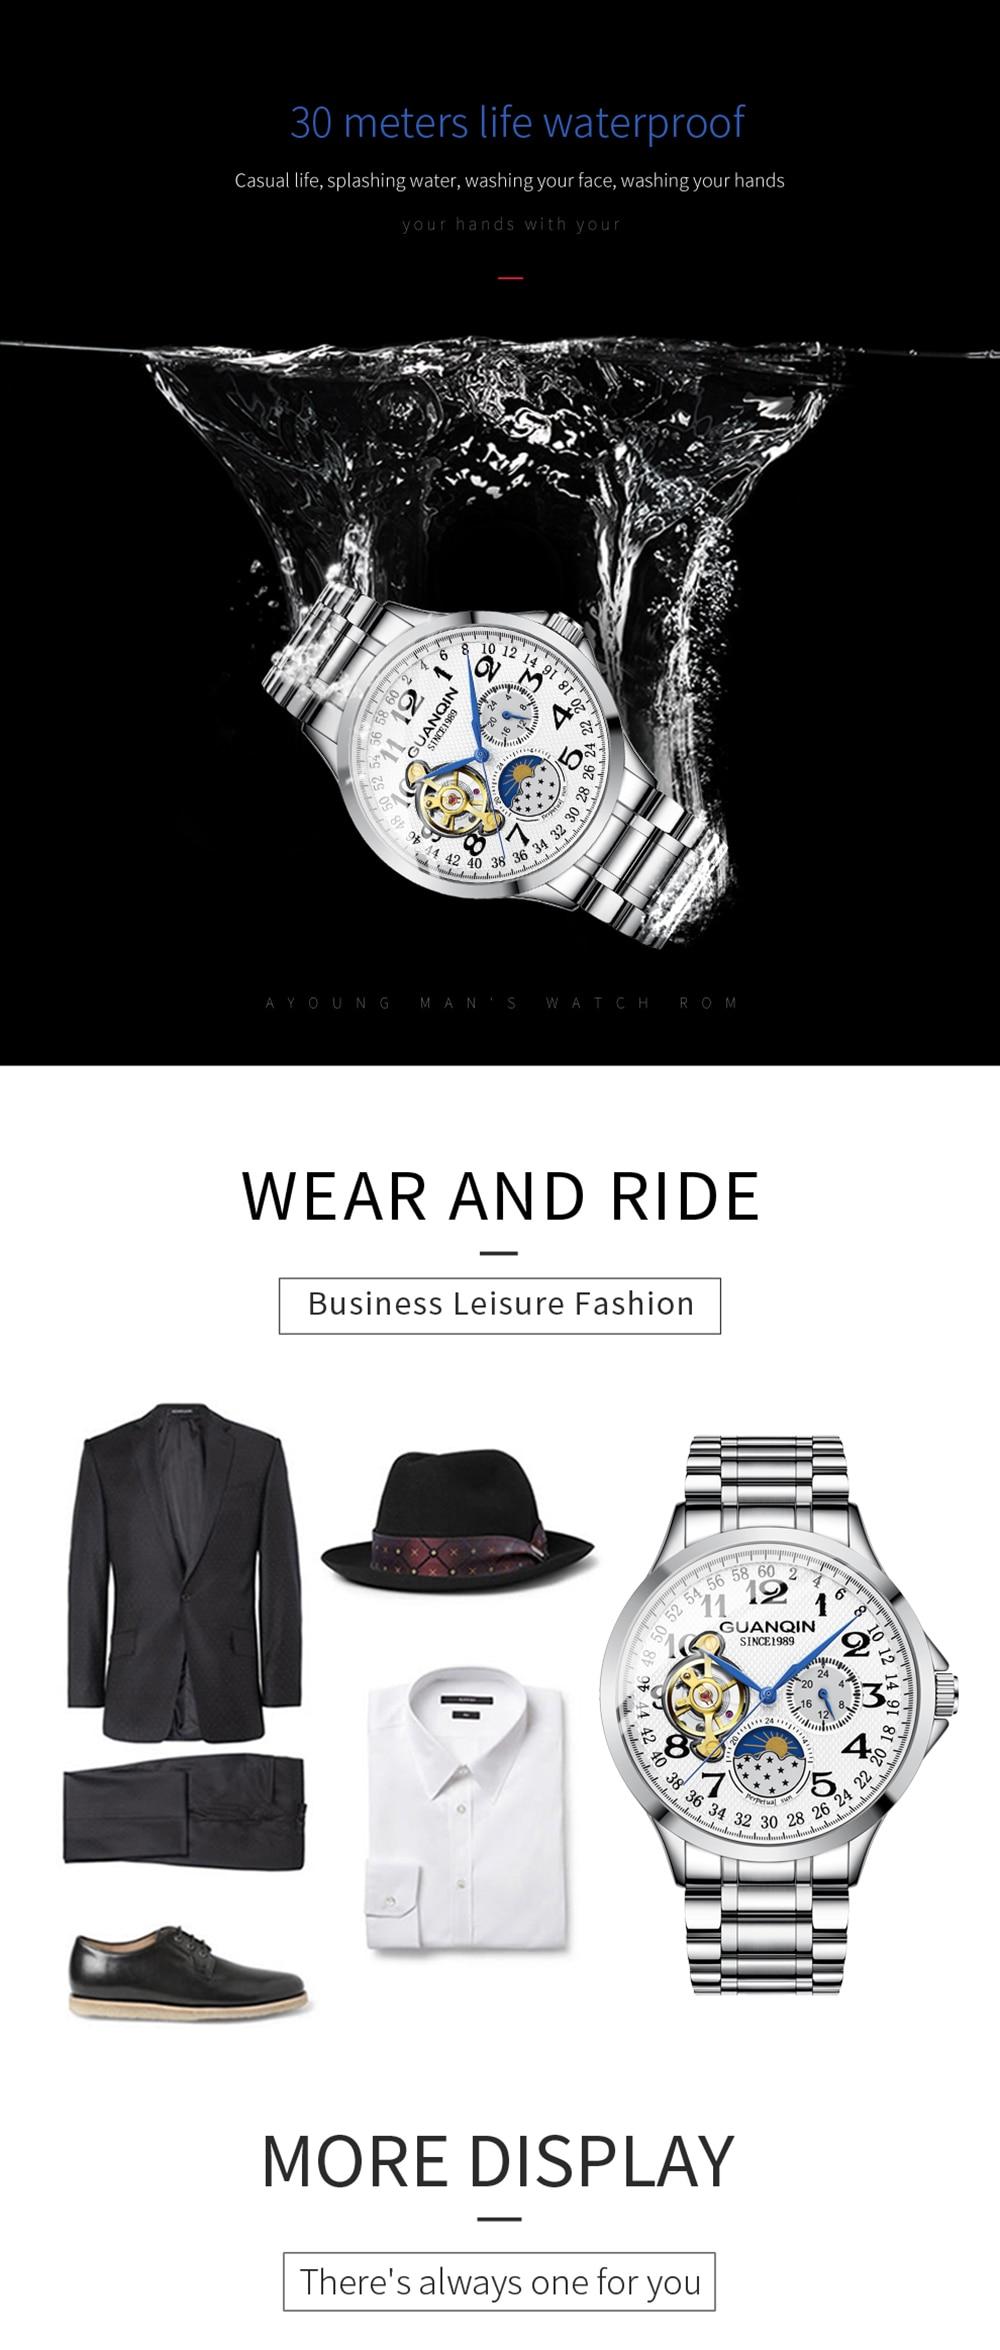 HTB1A8D1XL1G3KVjSZFkq6yK4XXaX GUANQIN mechanical watch men waterproof automatic skeleton tourbillon clock men business top brand luxury Relogio Masculino